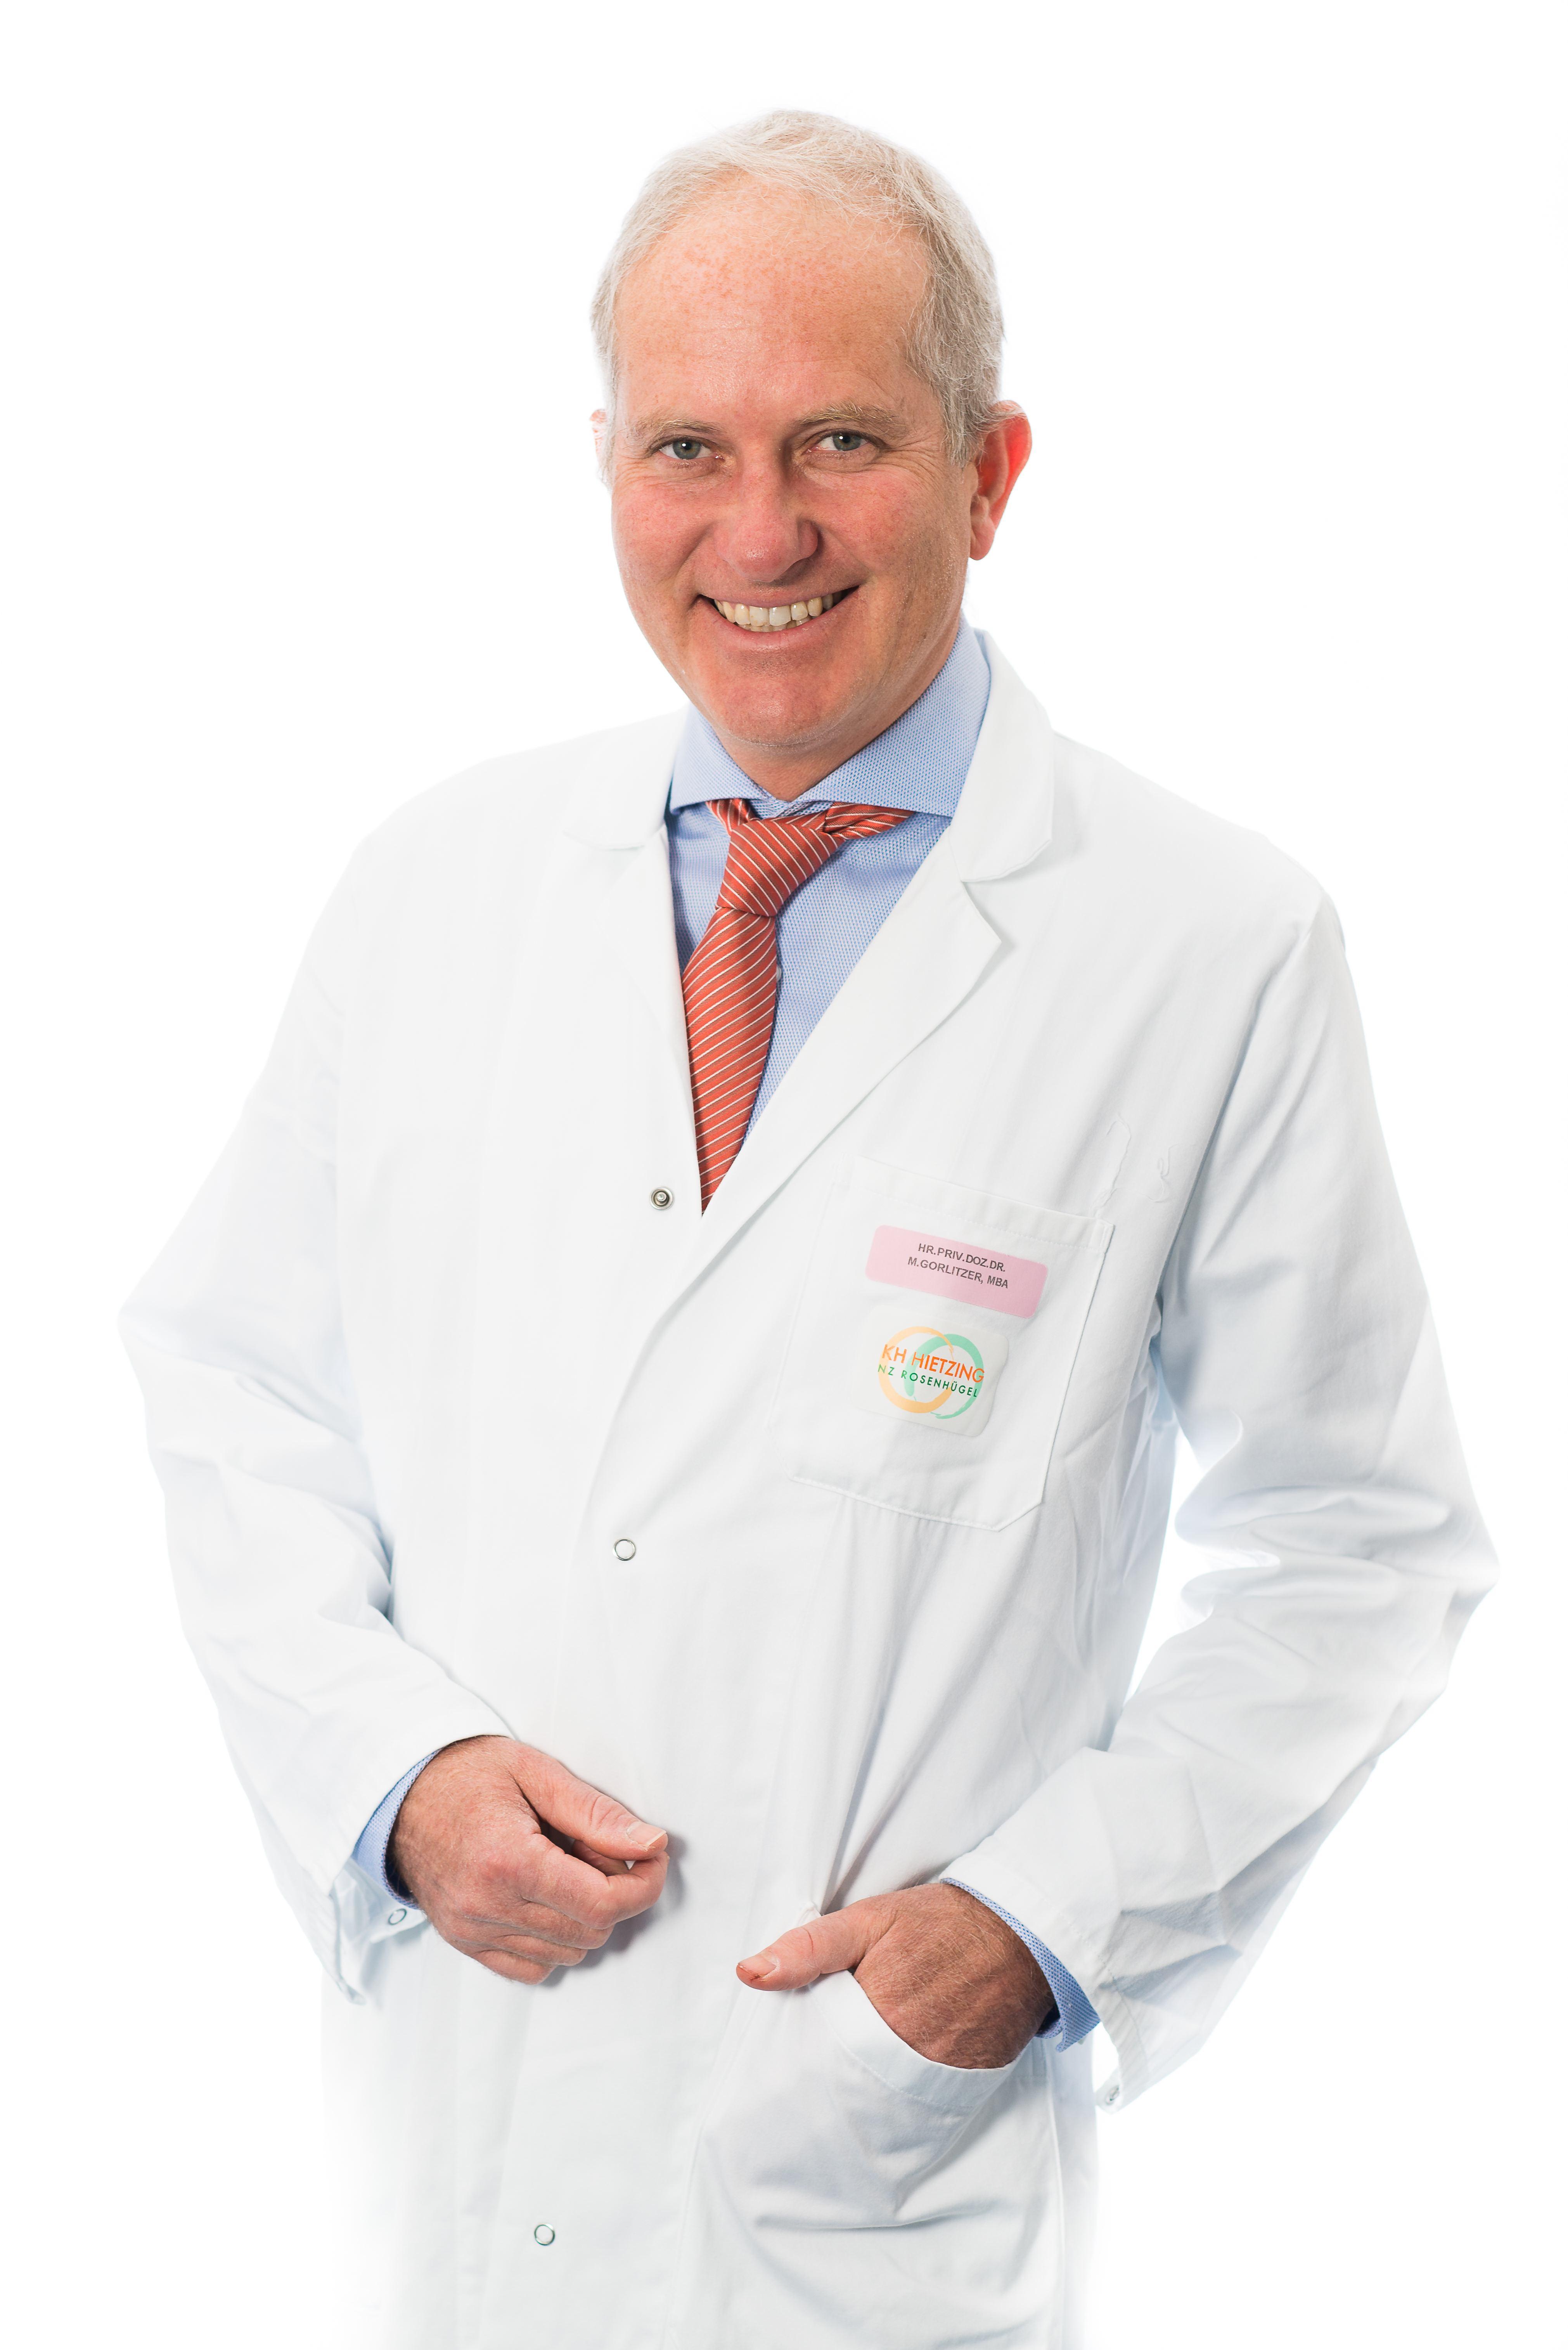 OA Univ. Doz. Dr. Michael Gorlitzer